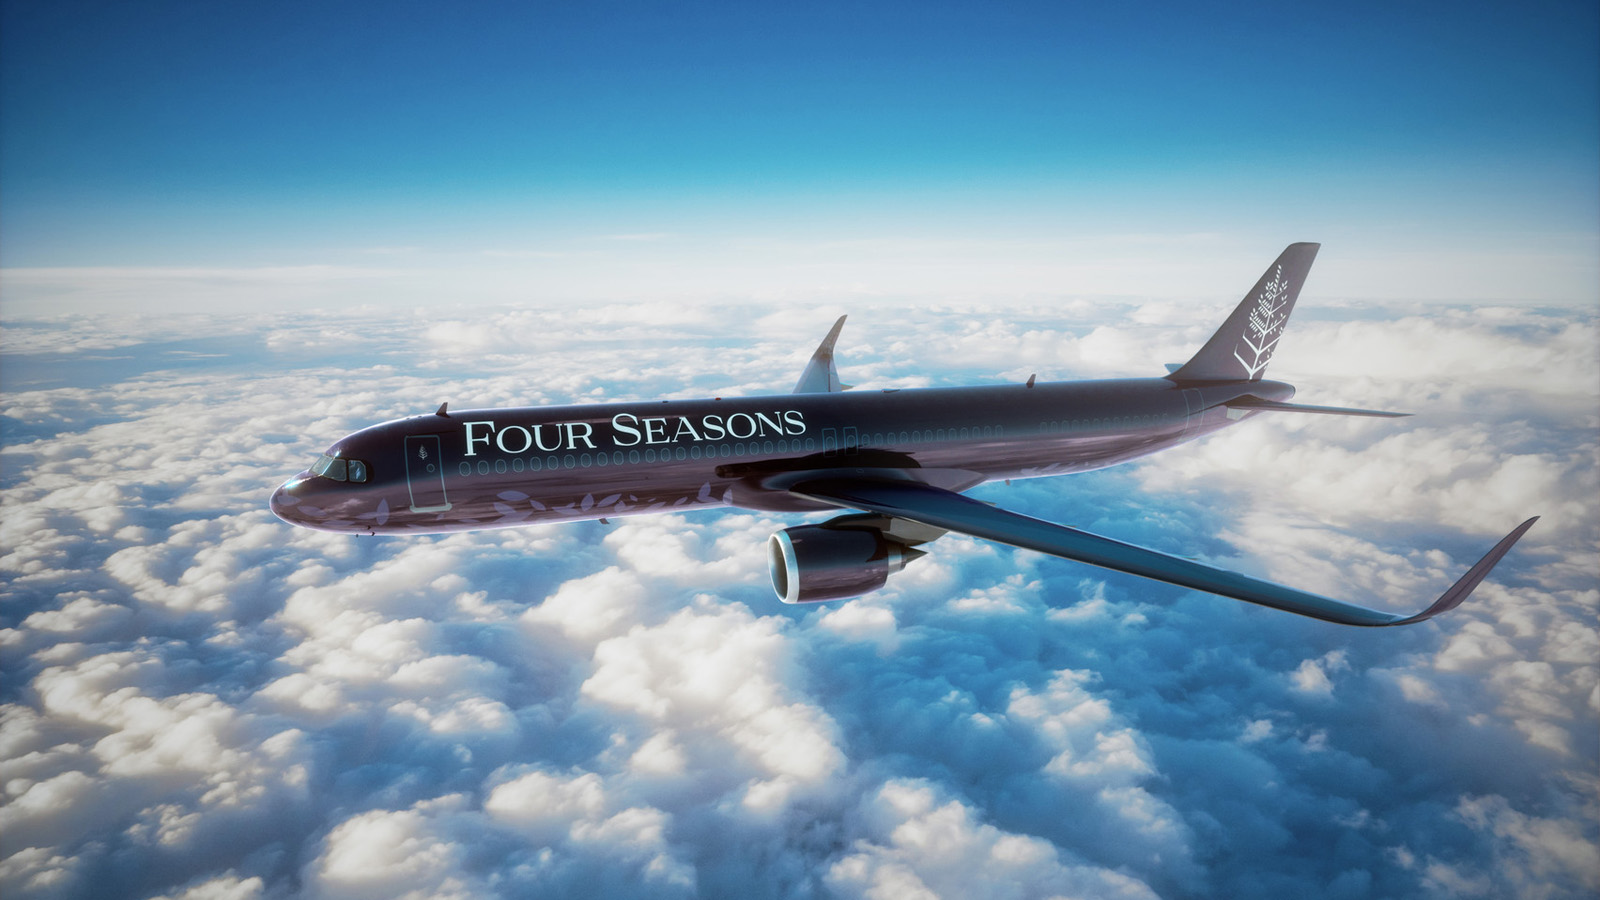 Jet Four Seasons